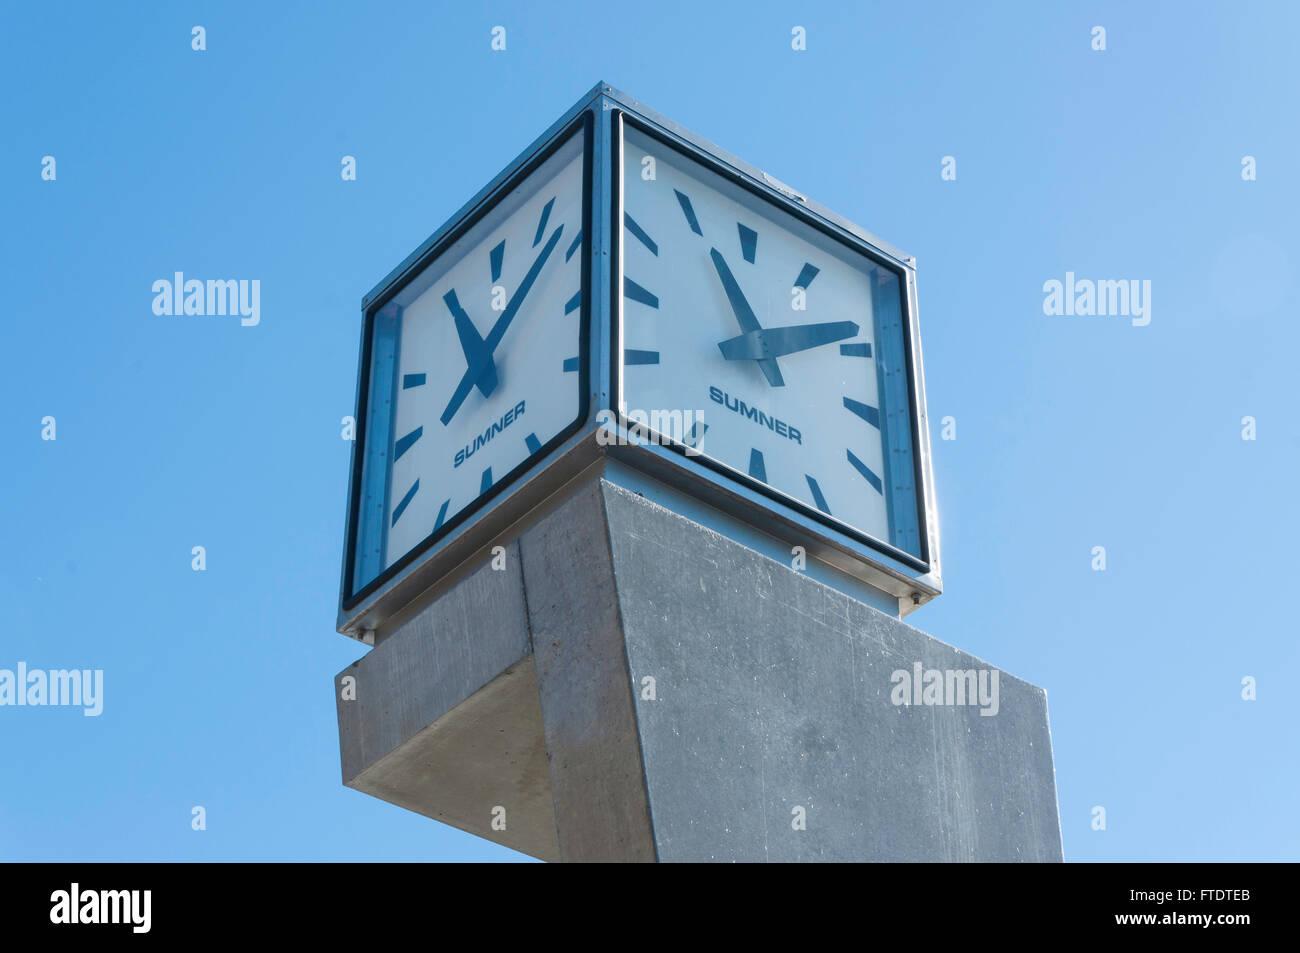 Clock tower at Sumner Surf Life Saving Club, Sumner, Christchurch, Canterbury Region, South Island, New Zealand - Stock Image